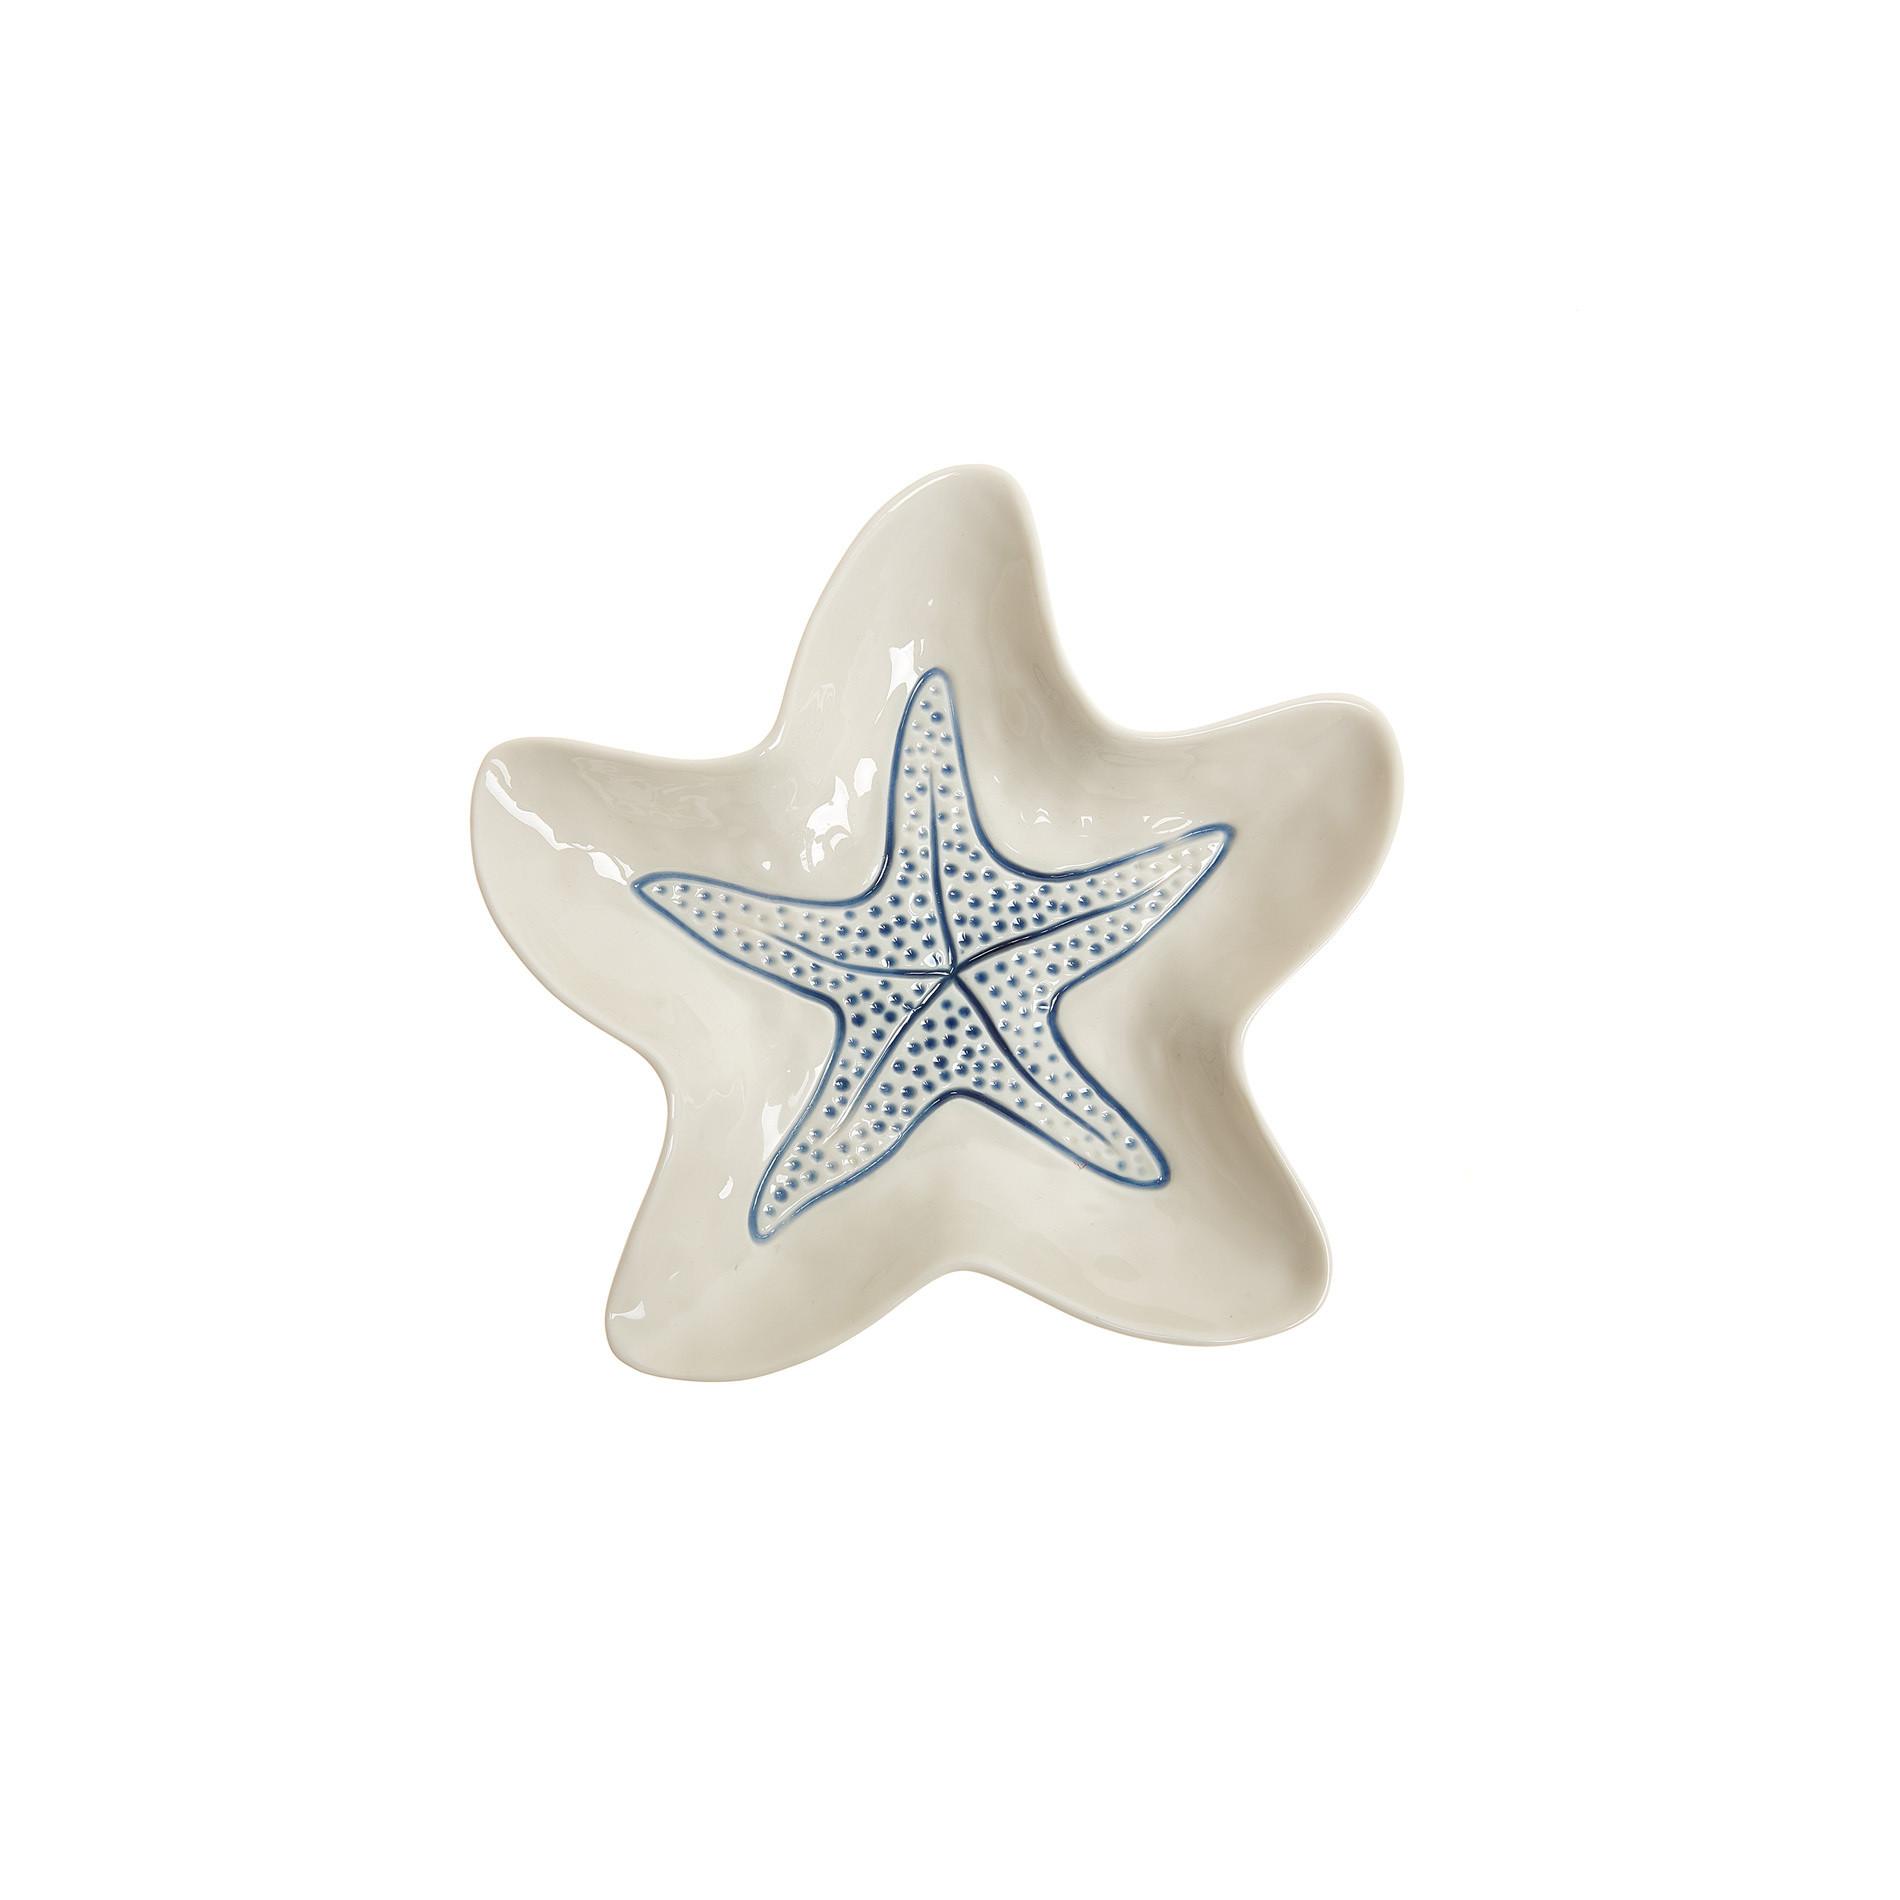 Coppetta porcellana a stella marina, Bianco, large image number 0